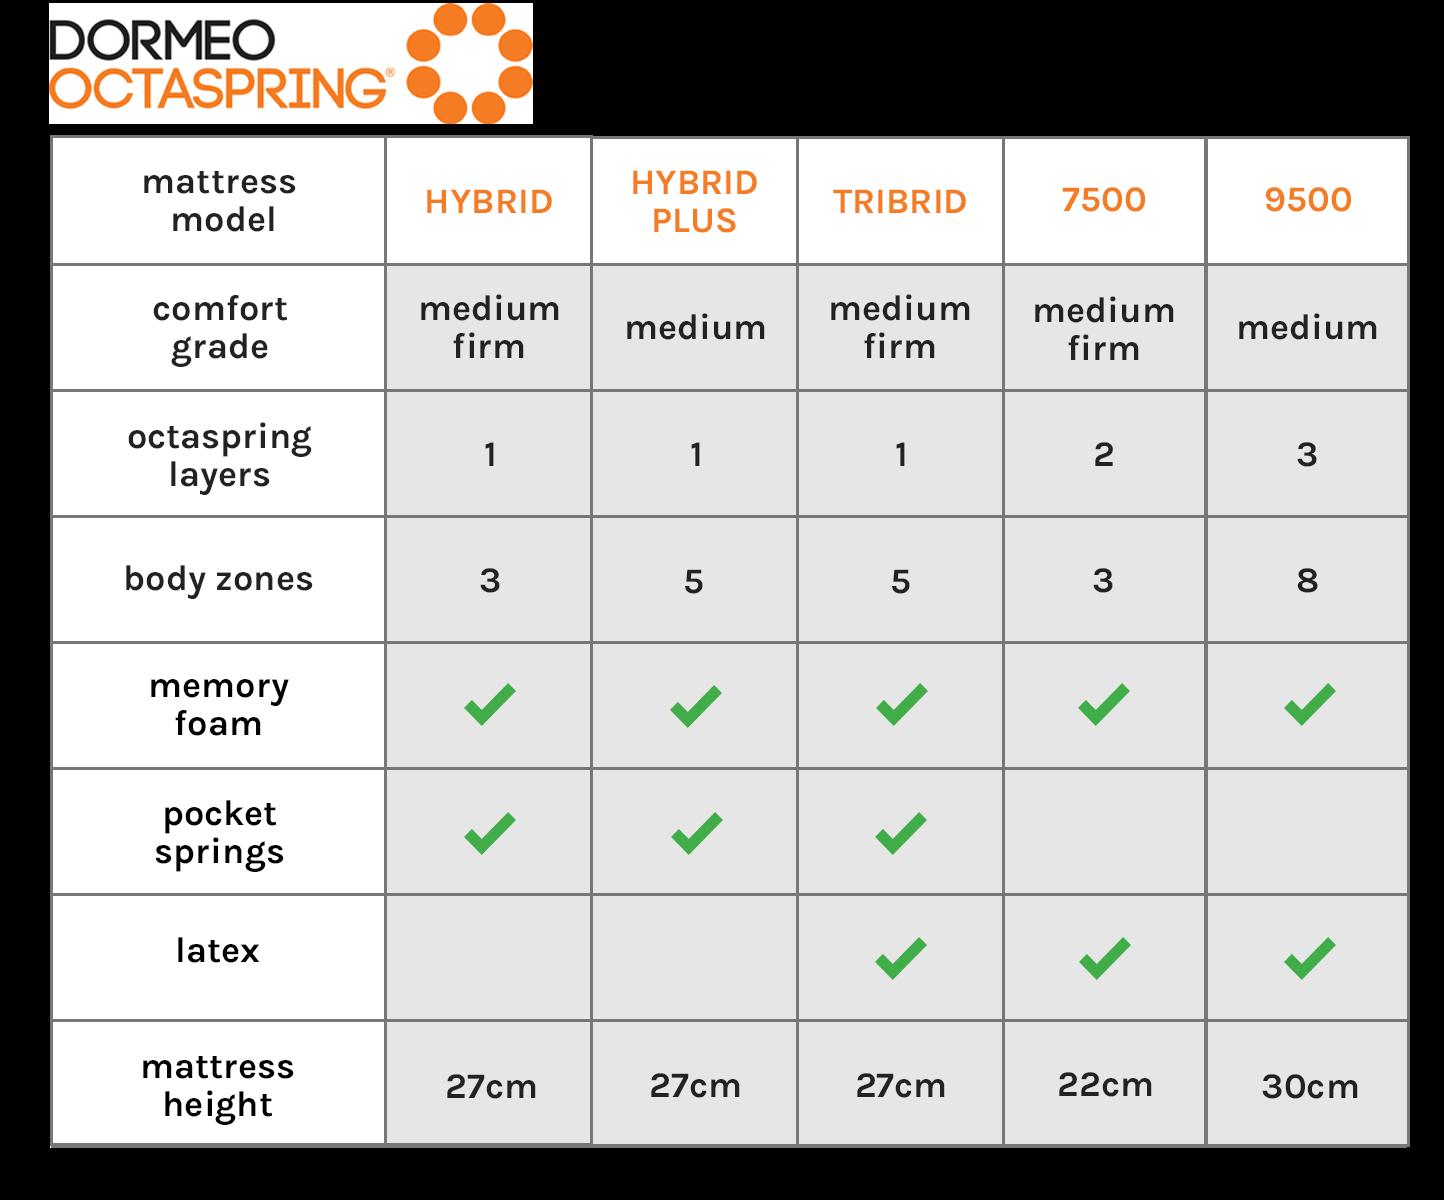 Dormeo Octaspring Tribrid Mattress Range